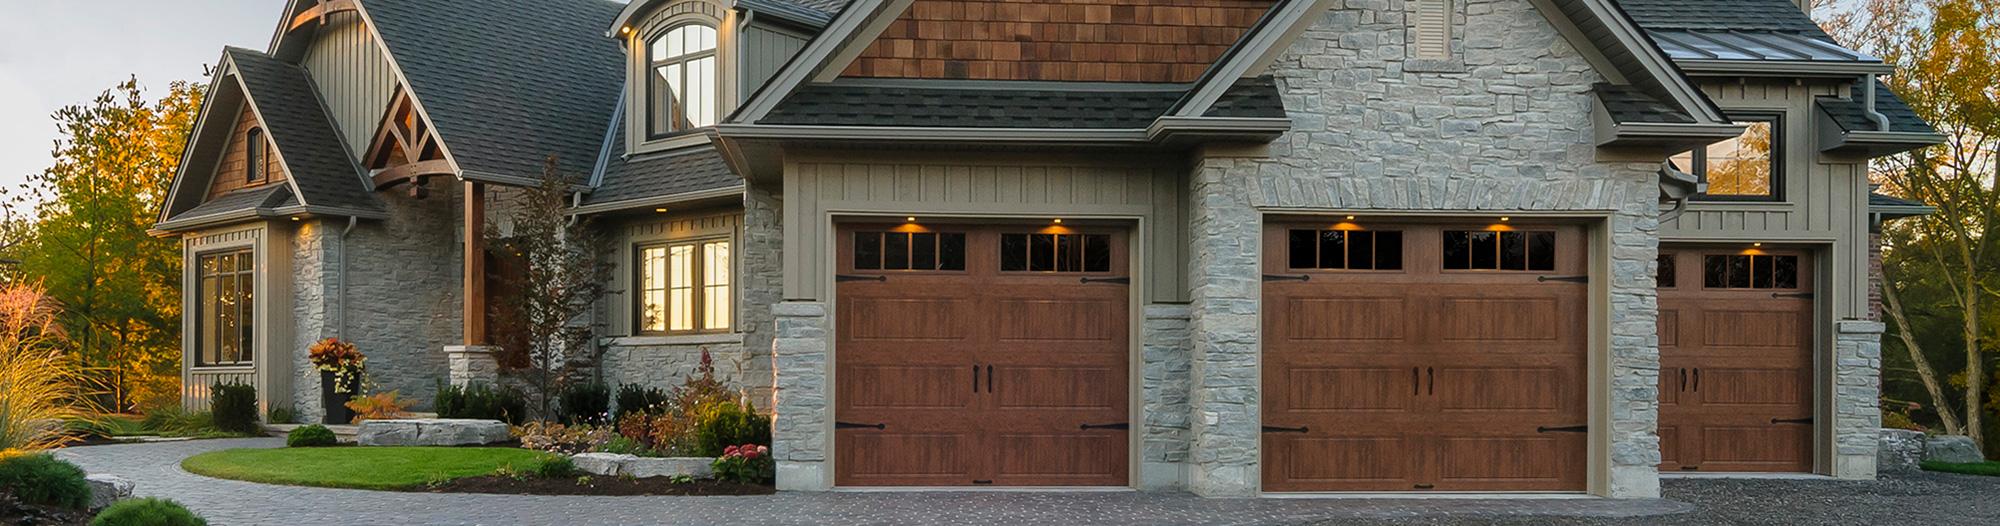 Clopay garage doors greensboro nc dandk organizer for Garage doors charlotte nc